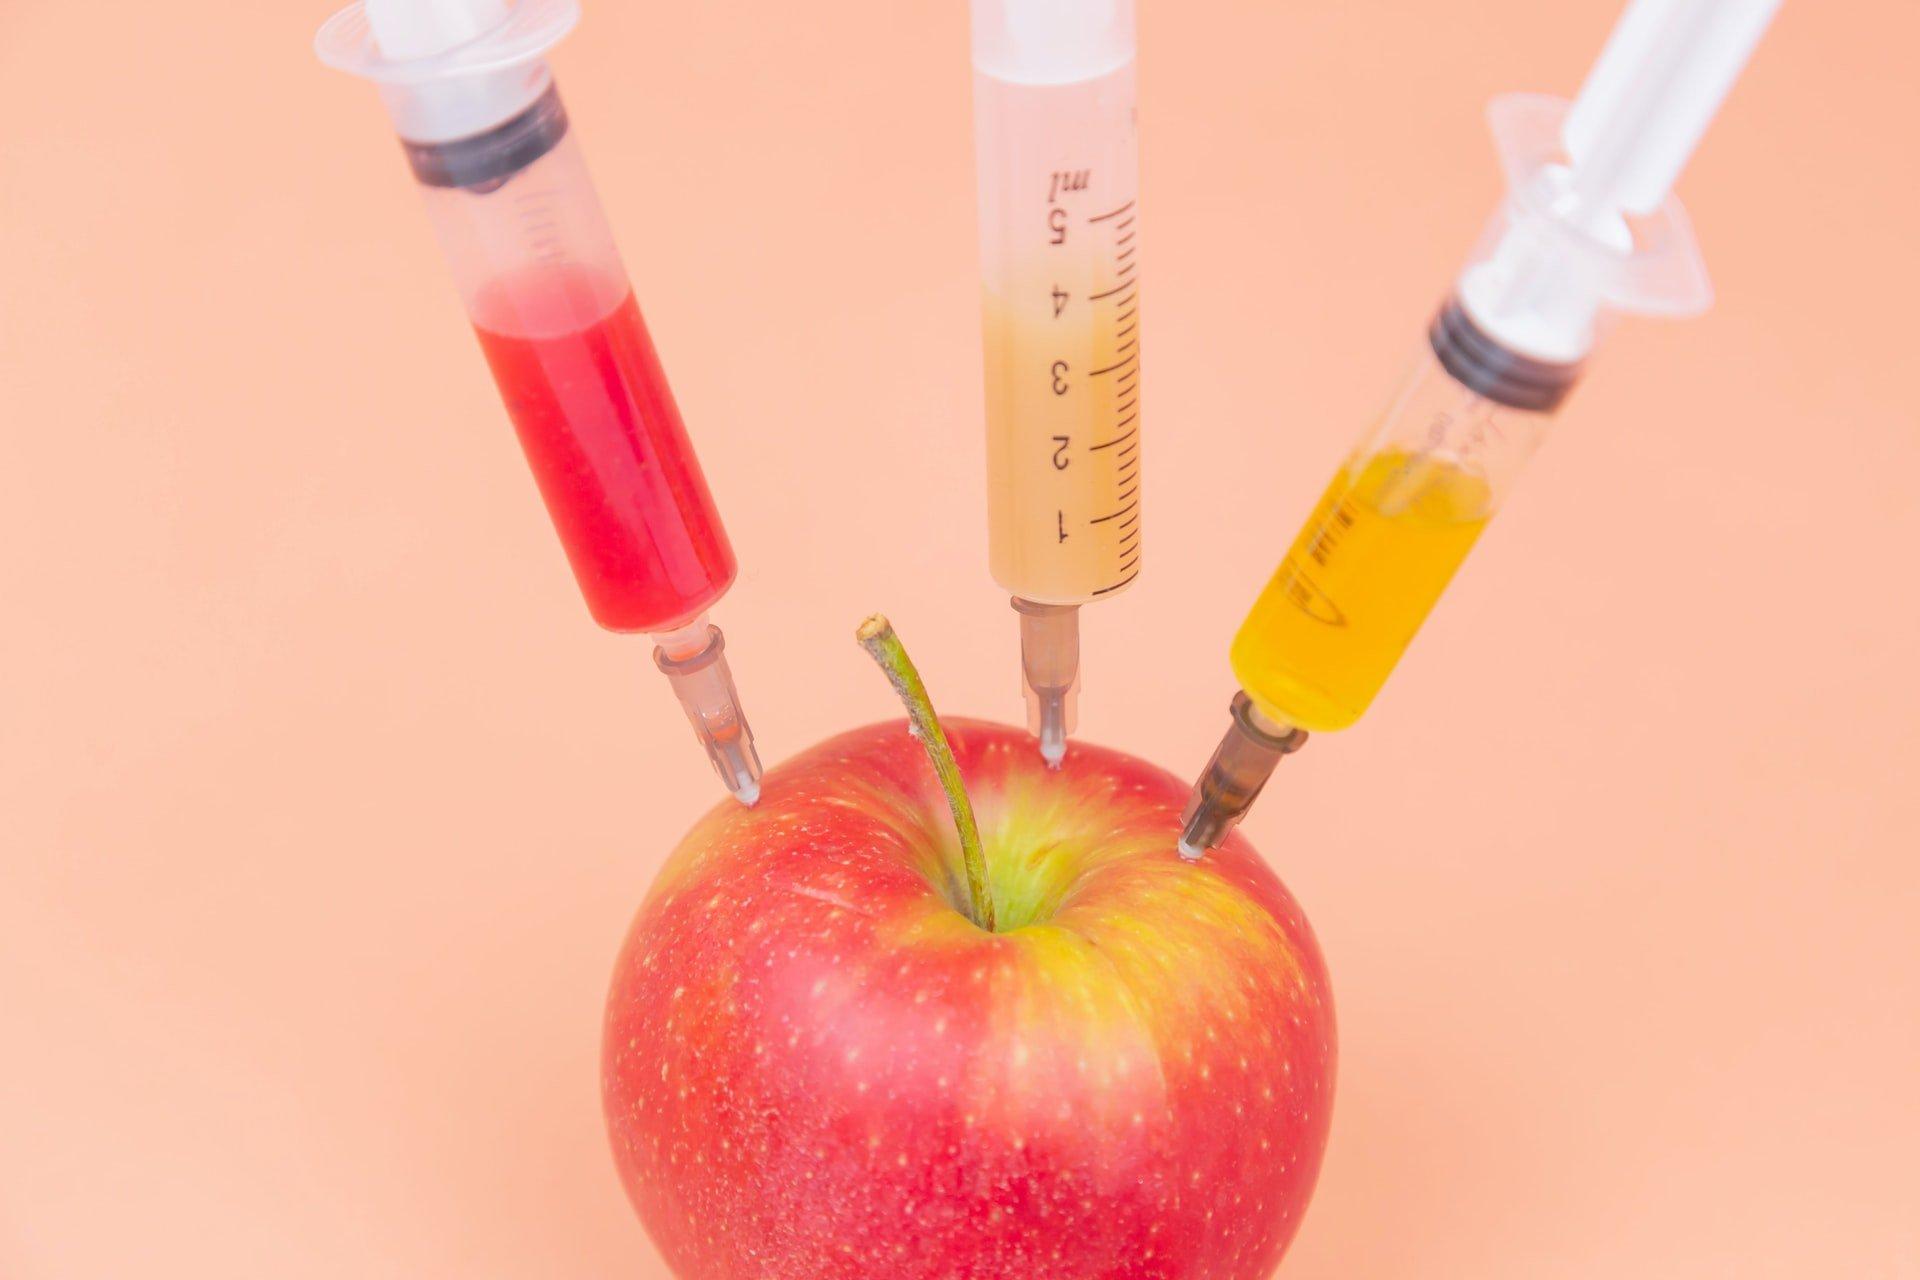 Lebensmittelwissenschaften studieren – dein Guide